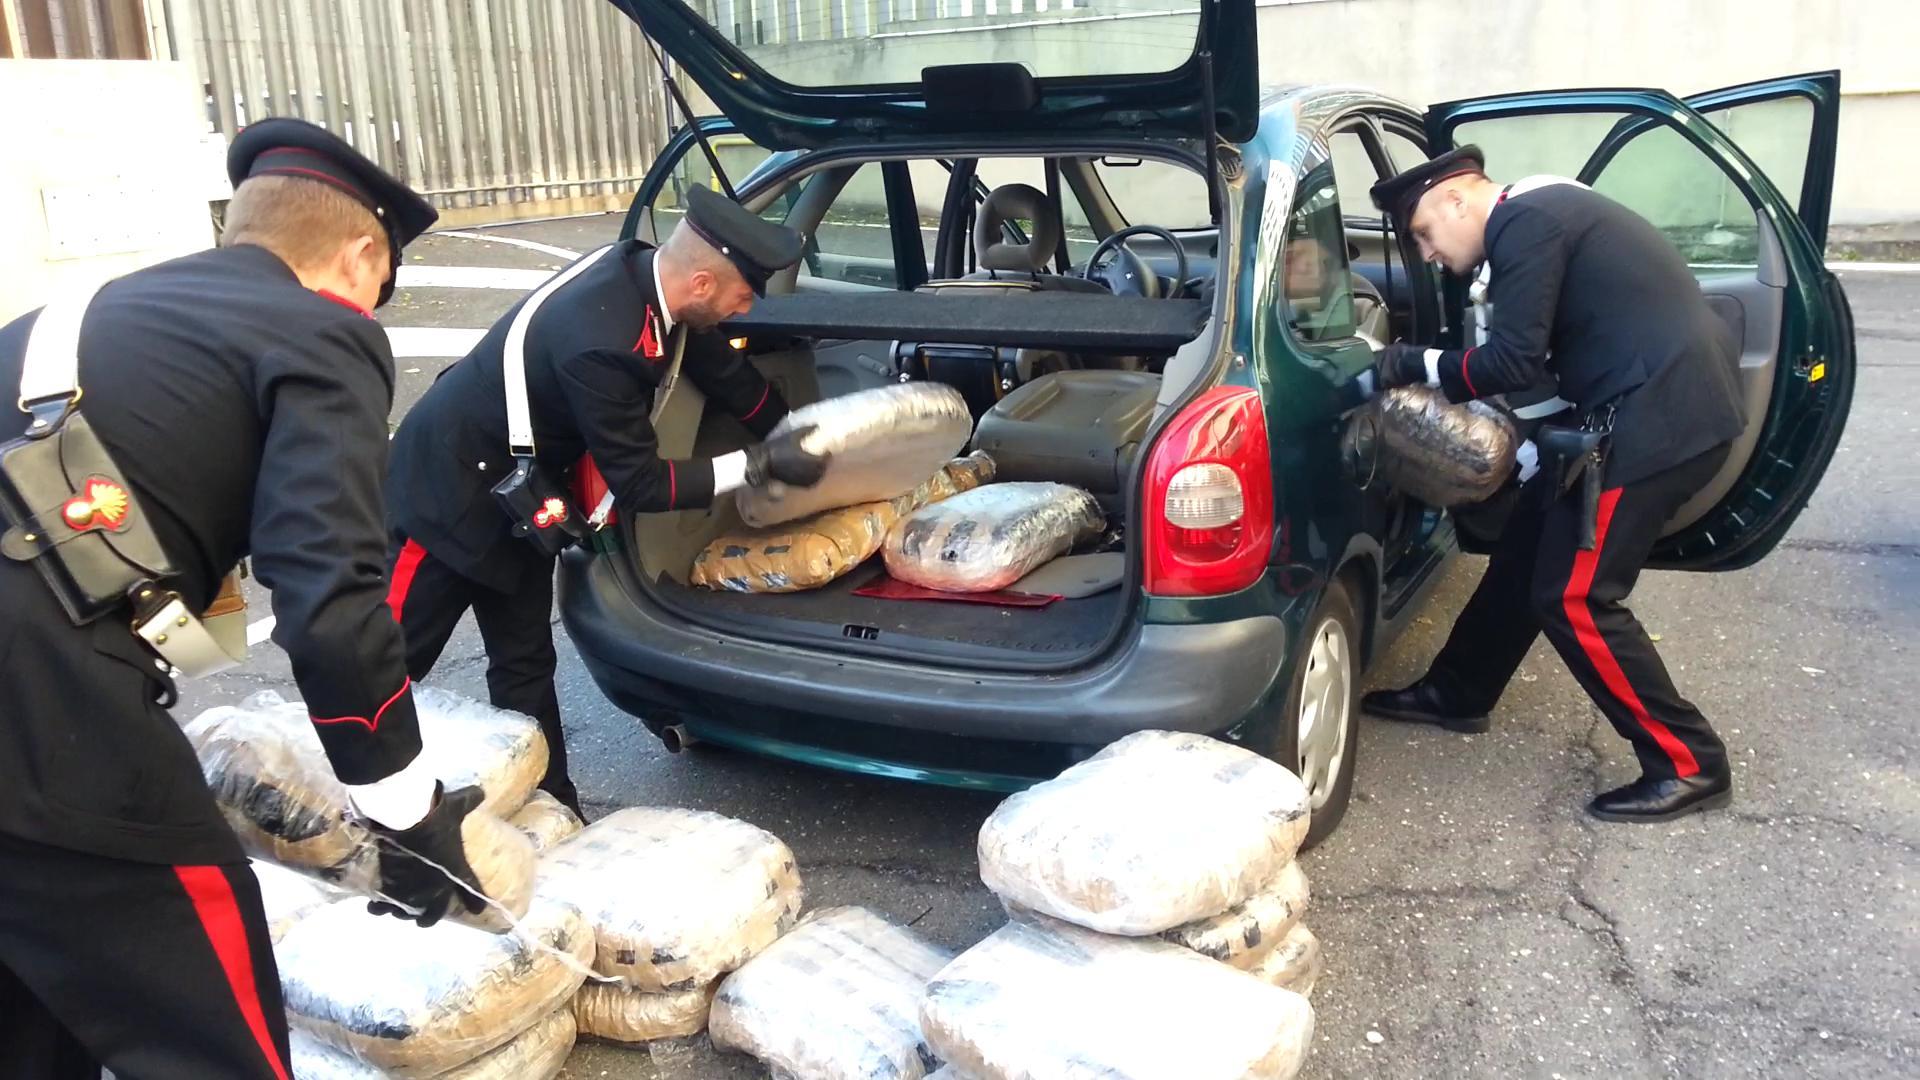 Operazione Cc a Palermo, 7 arresti